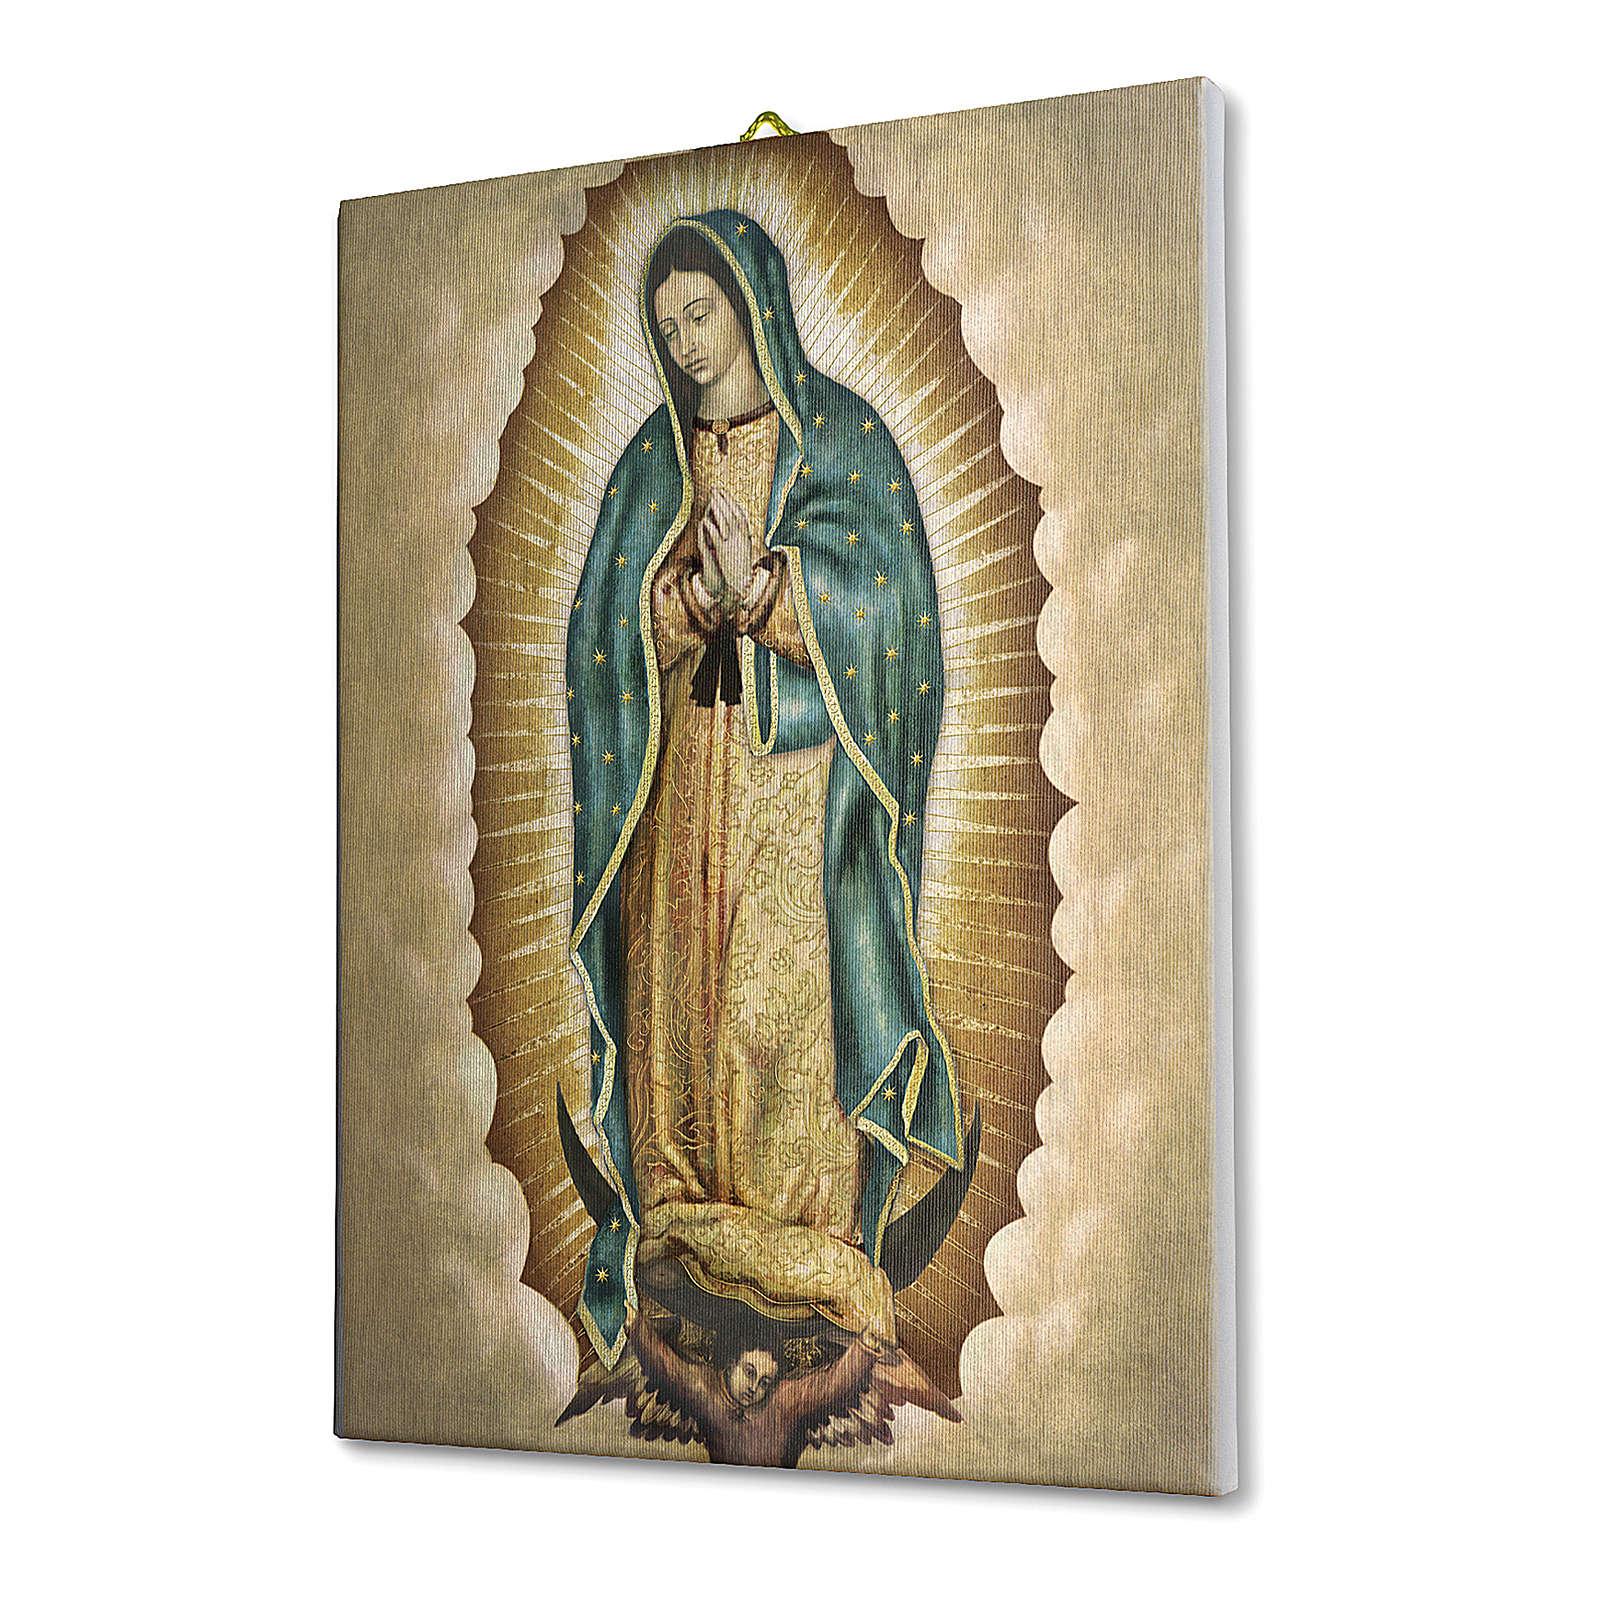 Cuadro sobre tela pictórica Virgen de Guadalupe 40x30 cm 3